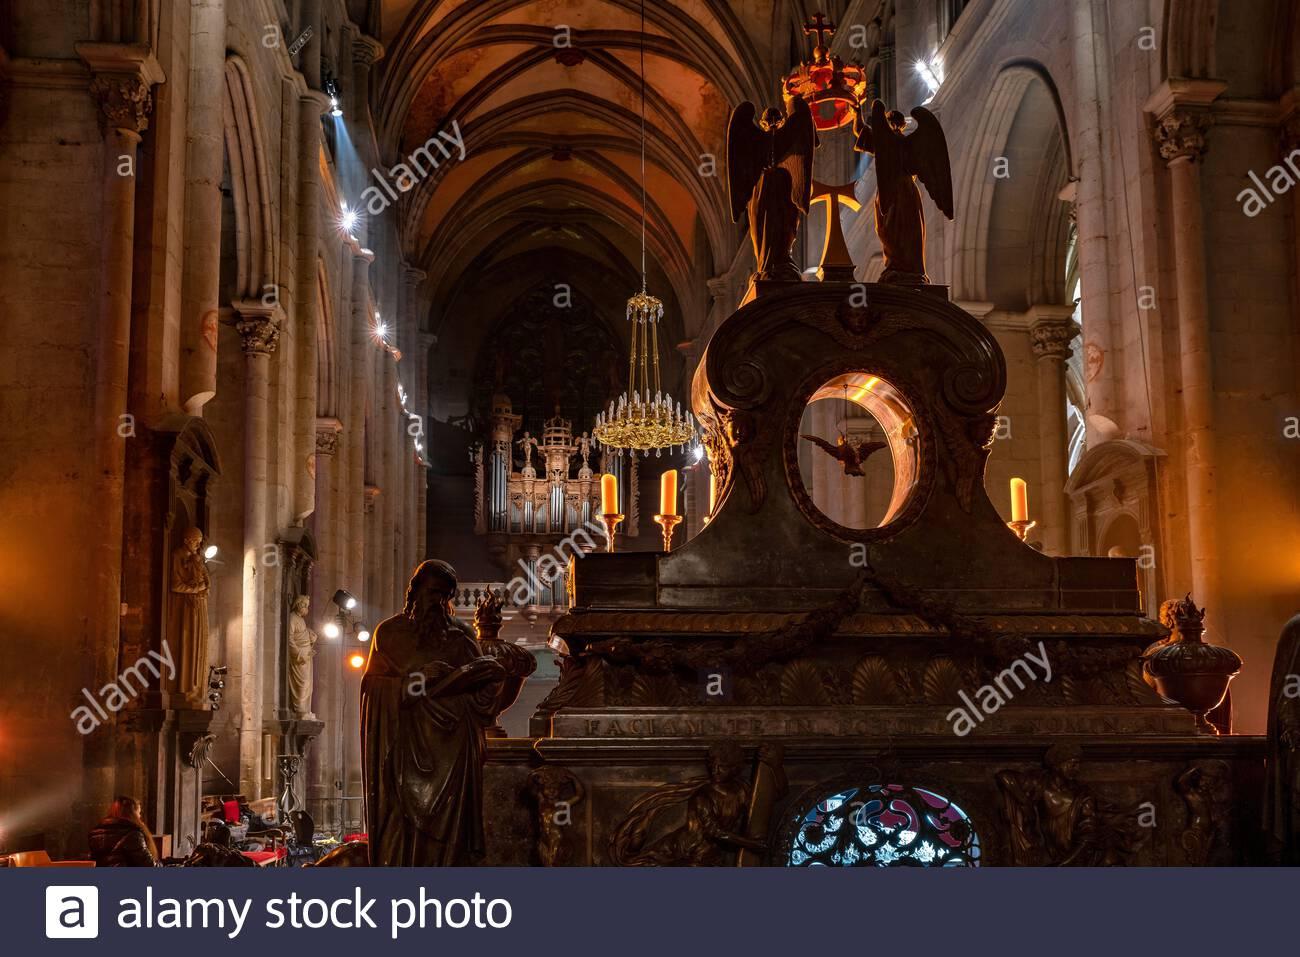 saint-antoine-labbaye-interior-of-the-ab